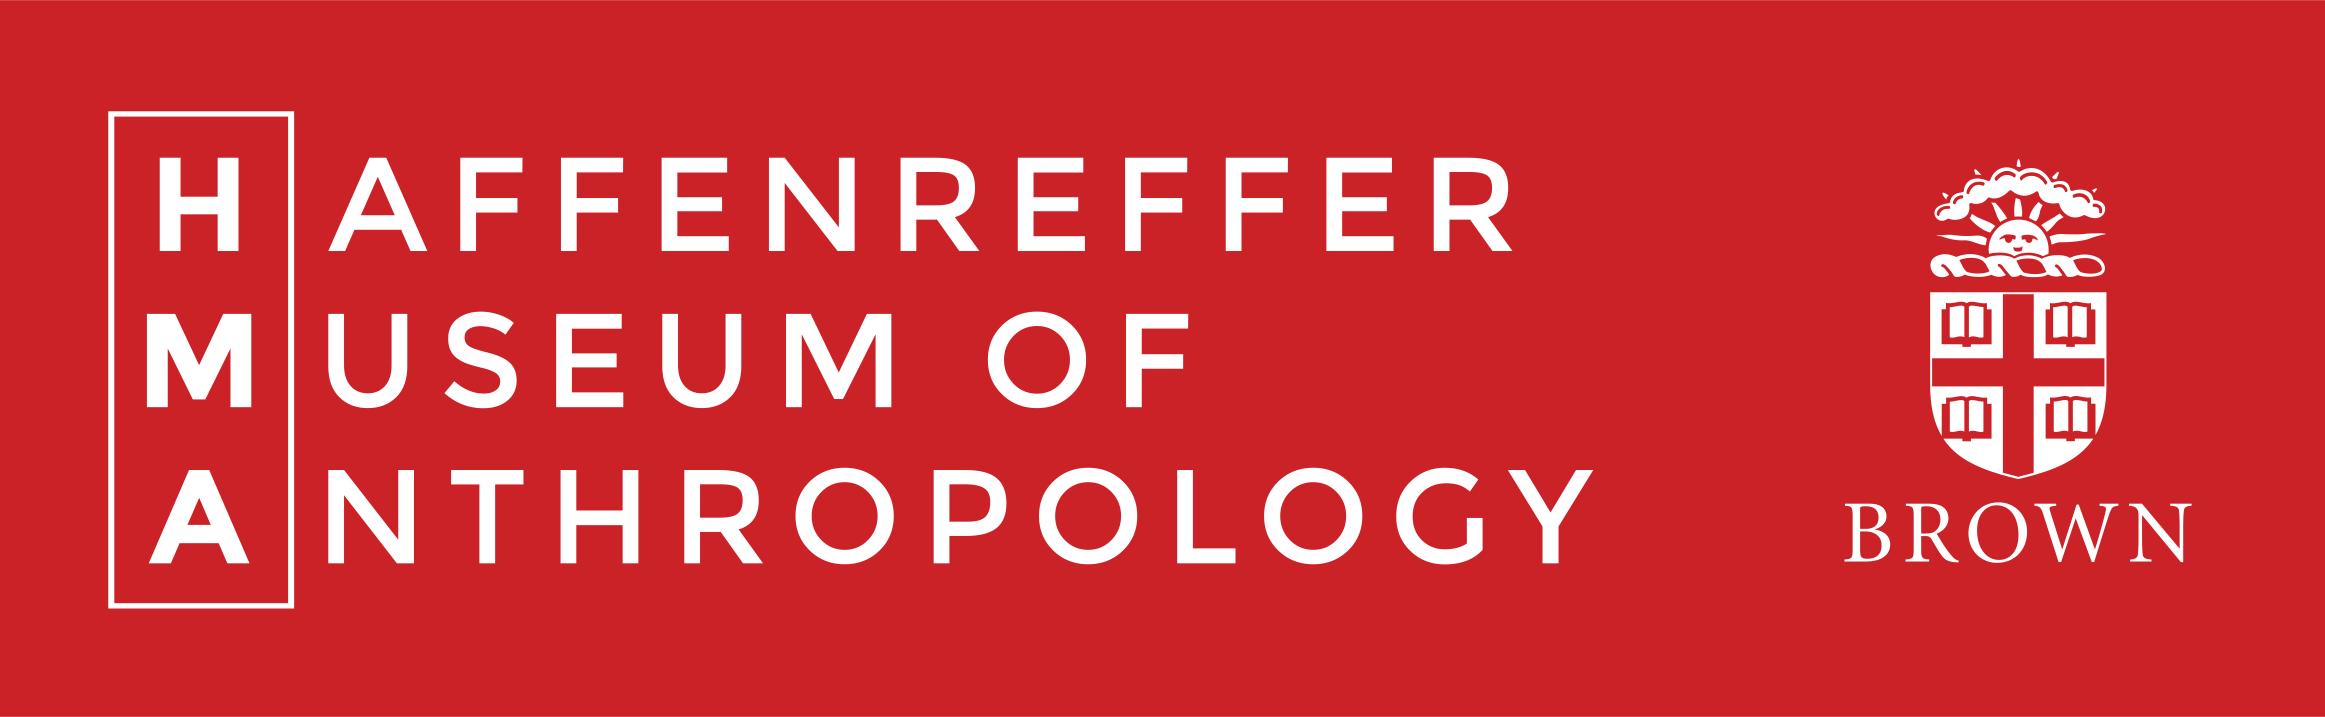 Haffenreffer Museum of Anthropology